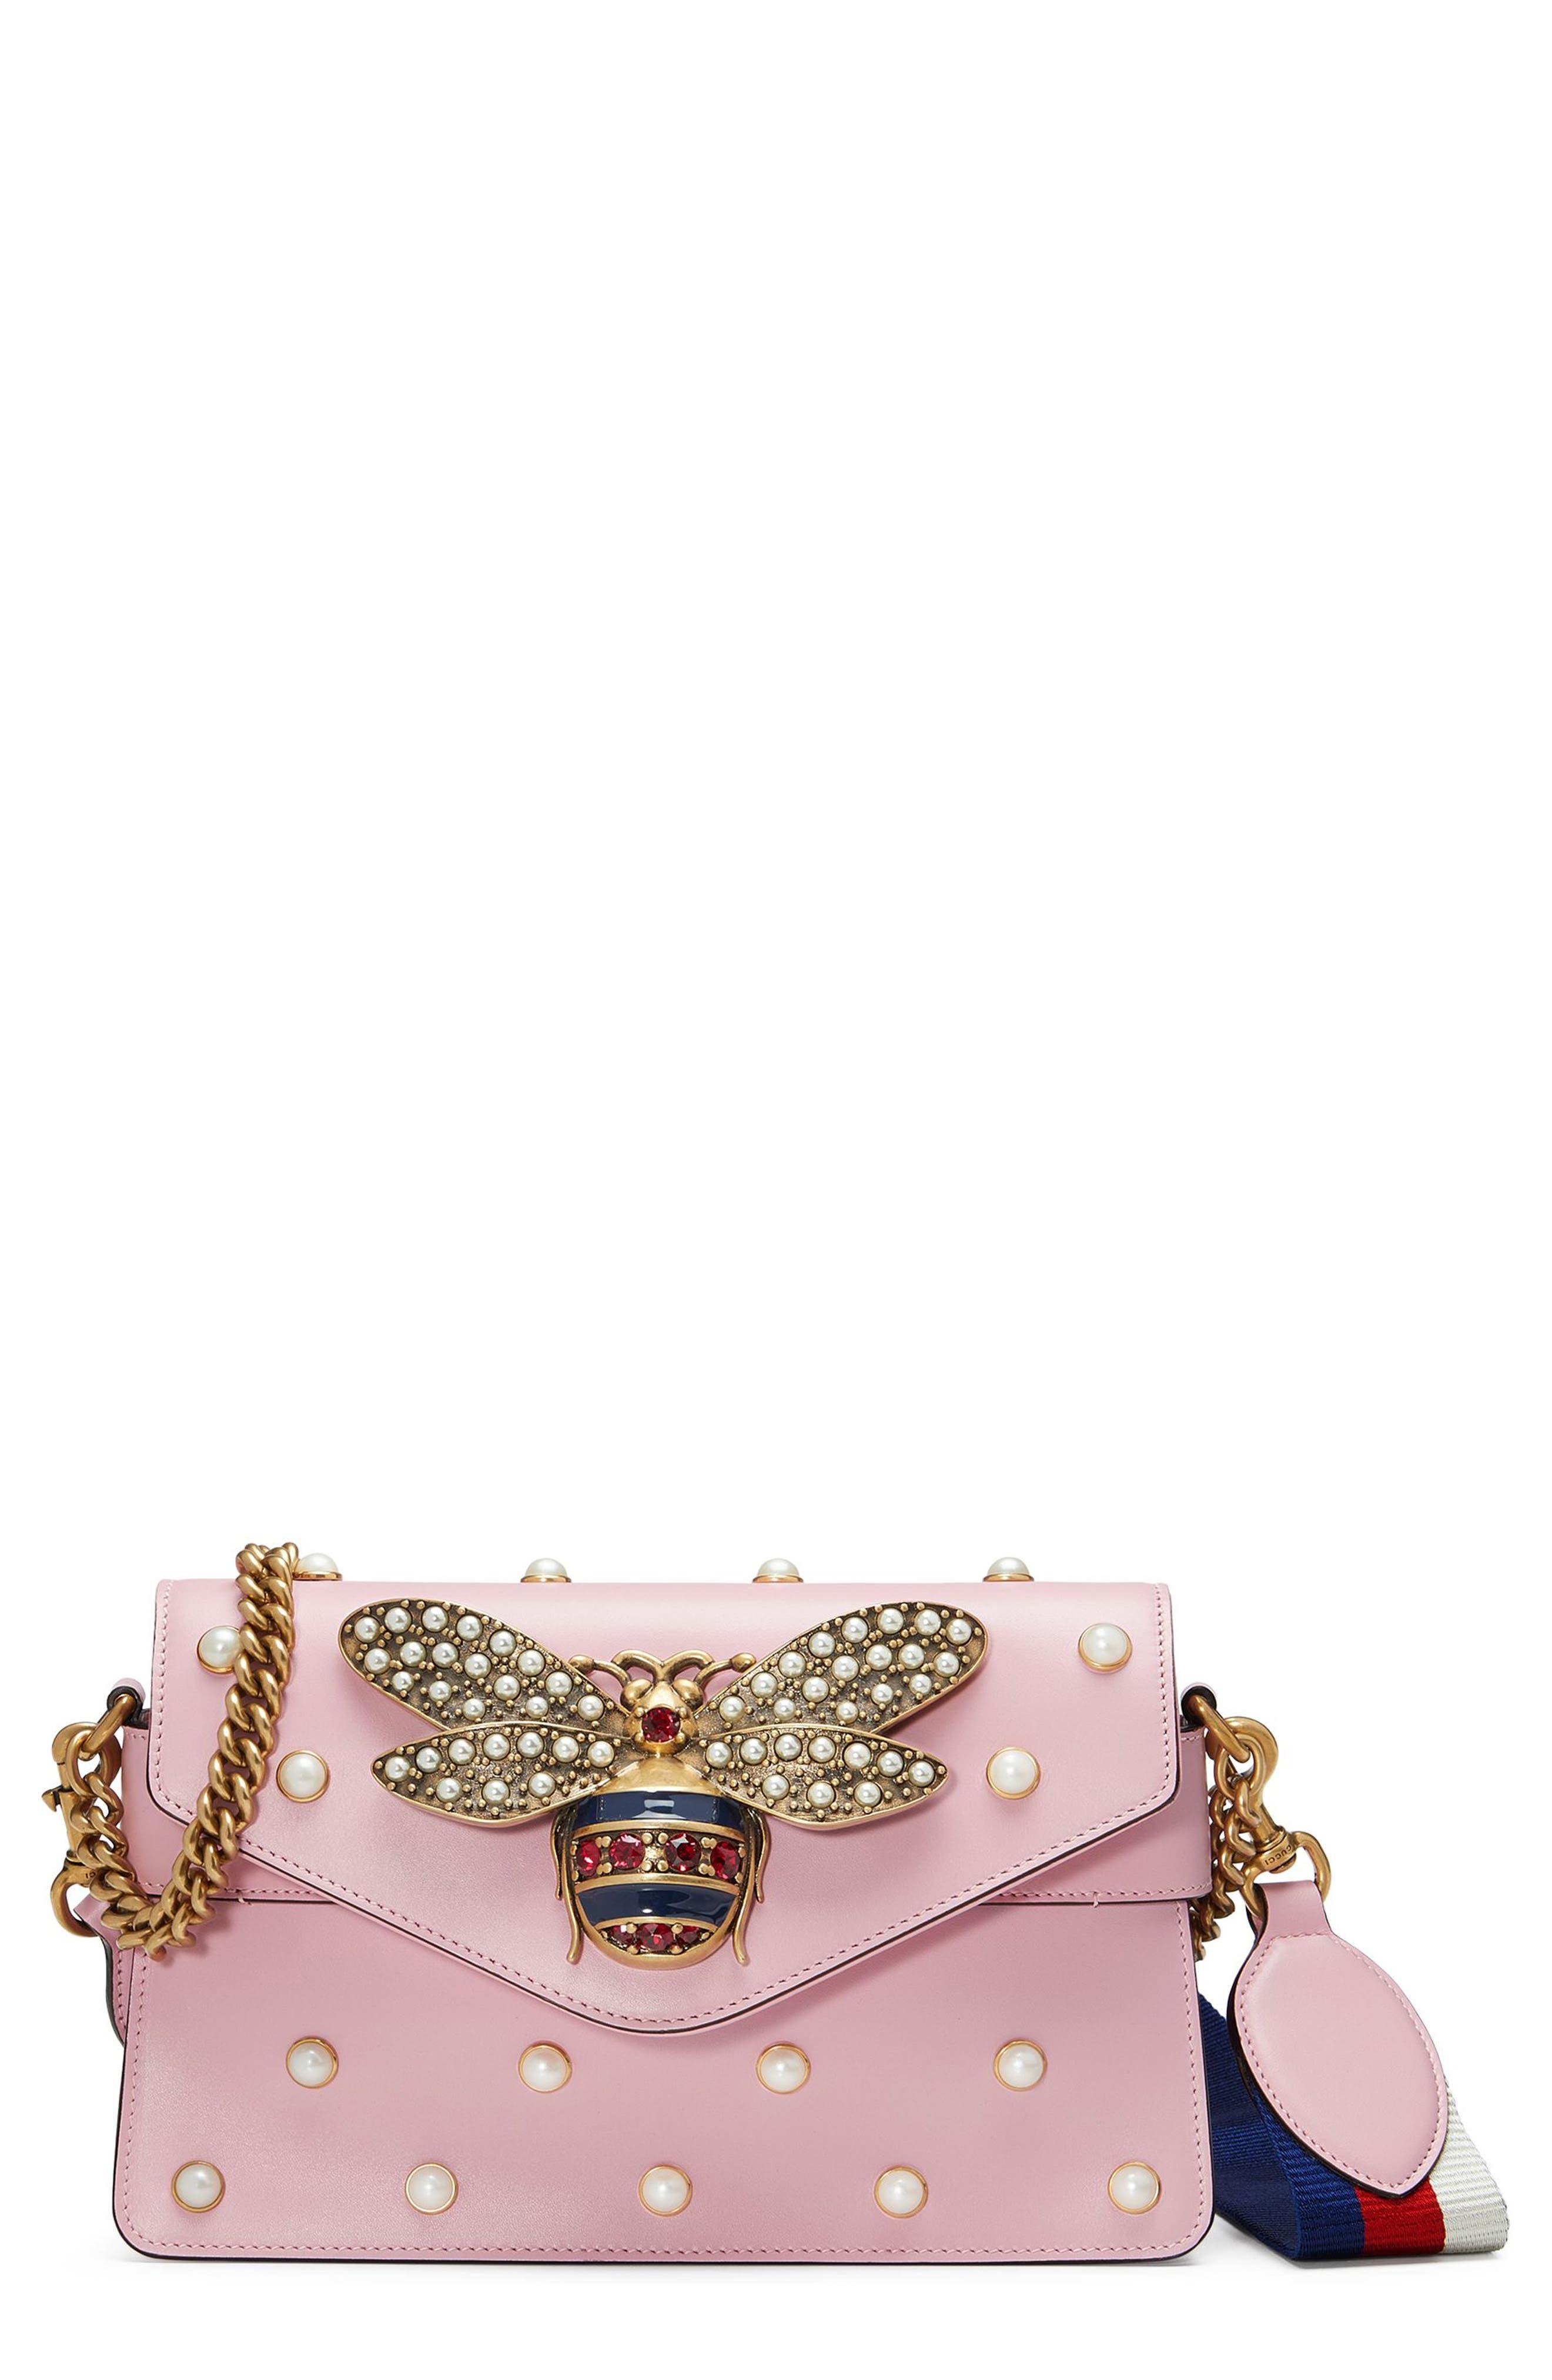 Main Image - Gucci Mini Broadway Leather Shoulder Bag